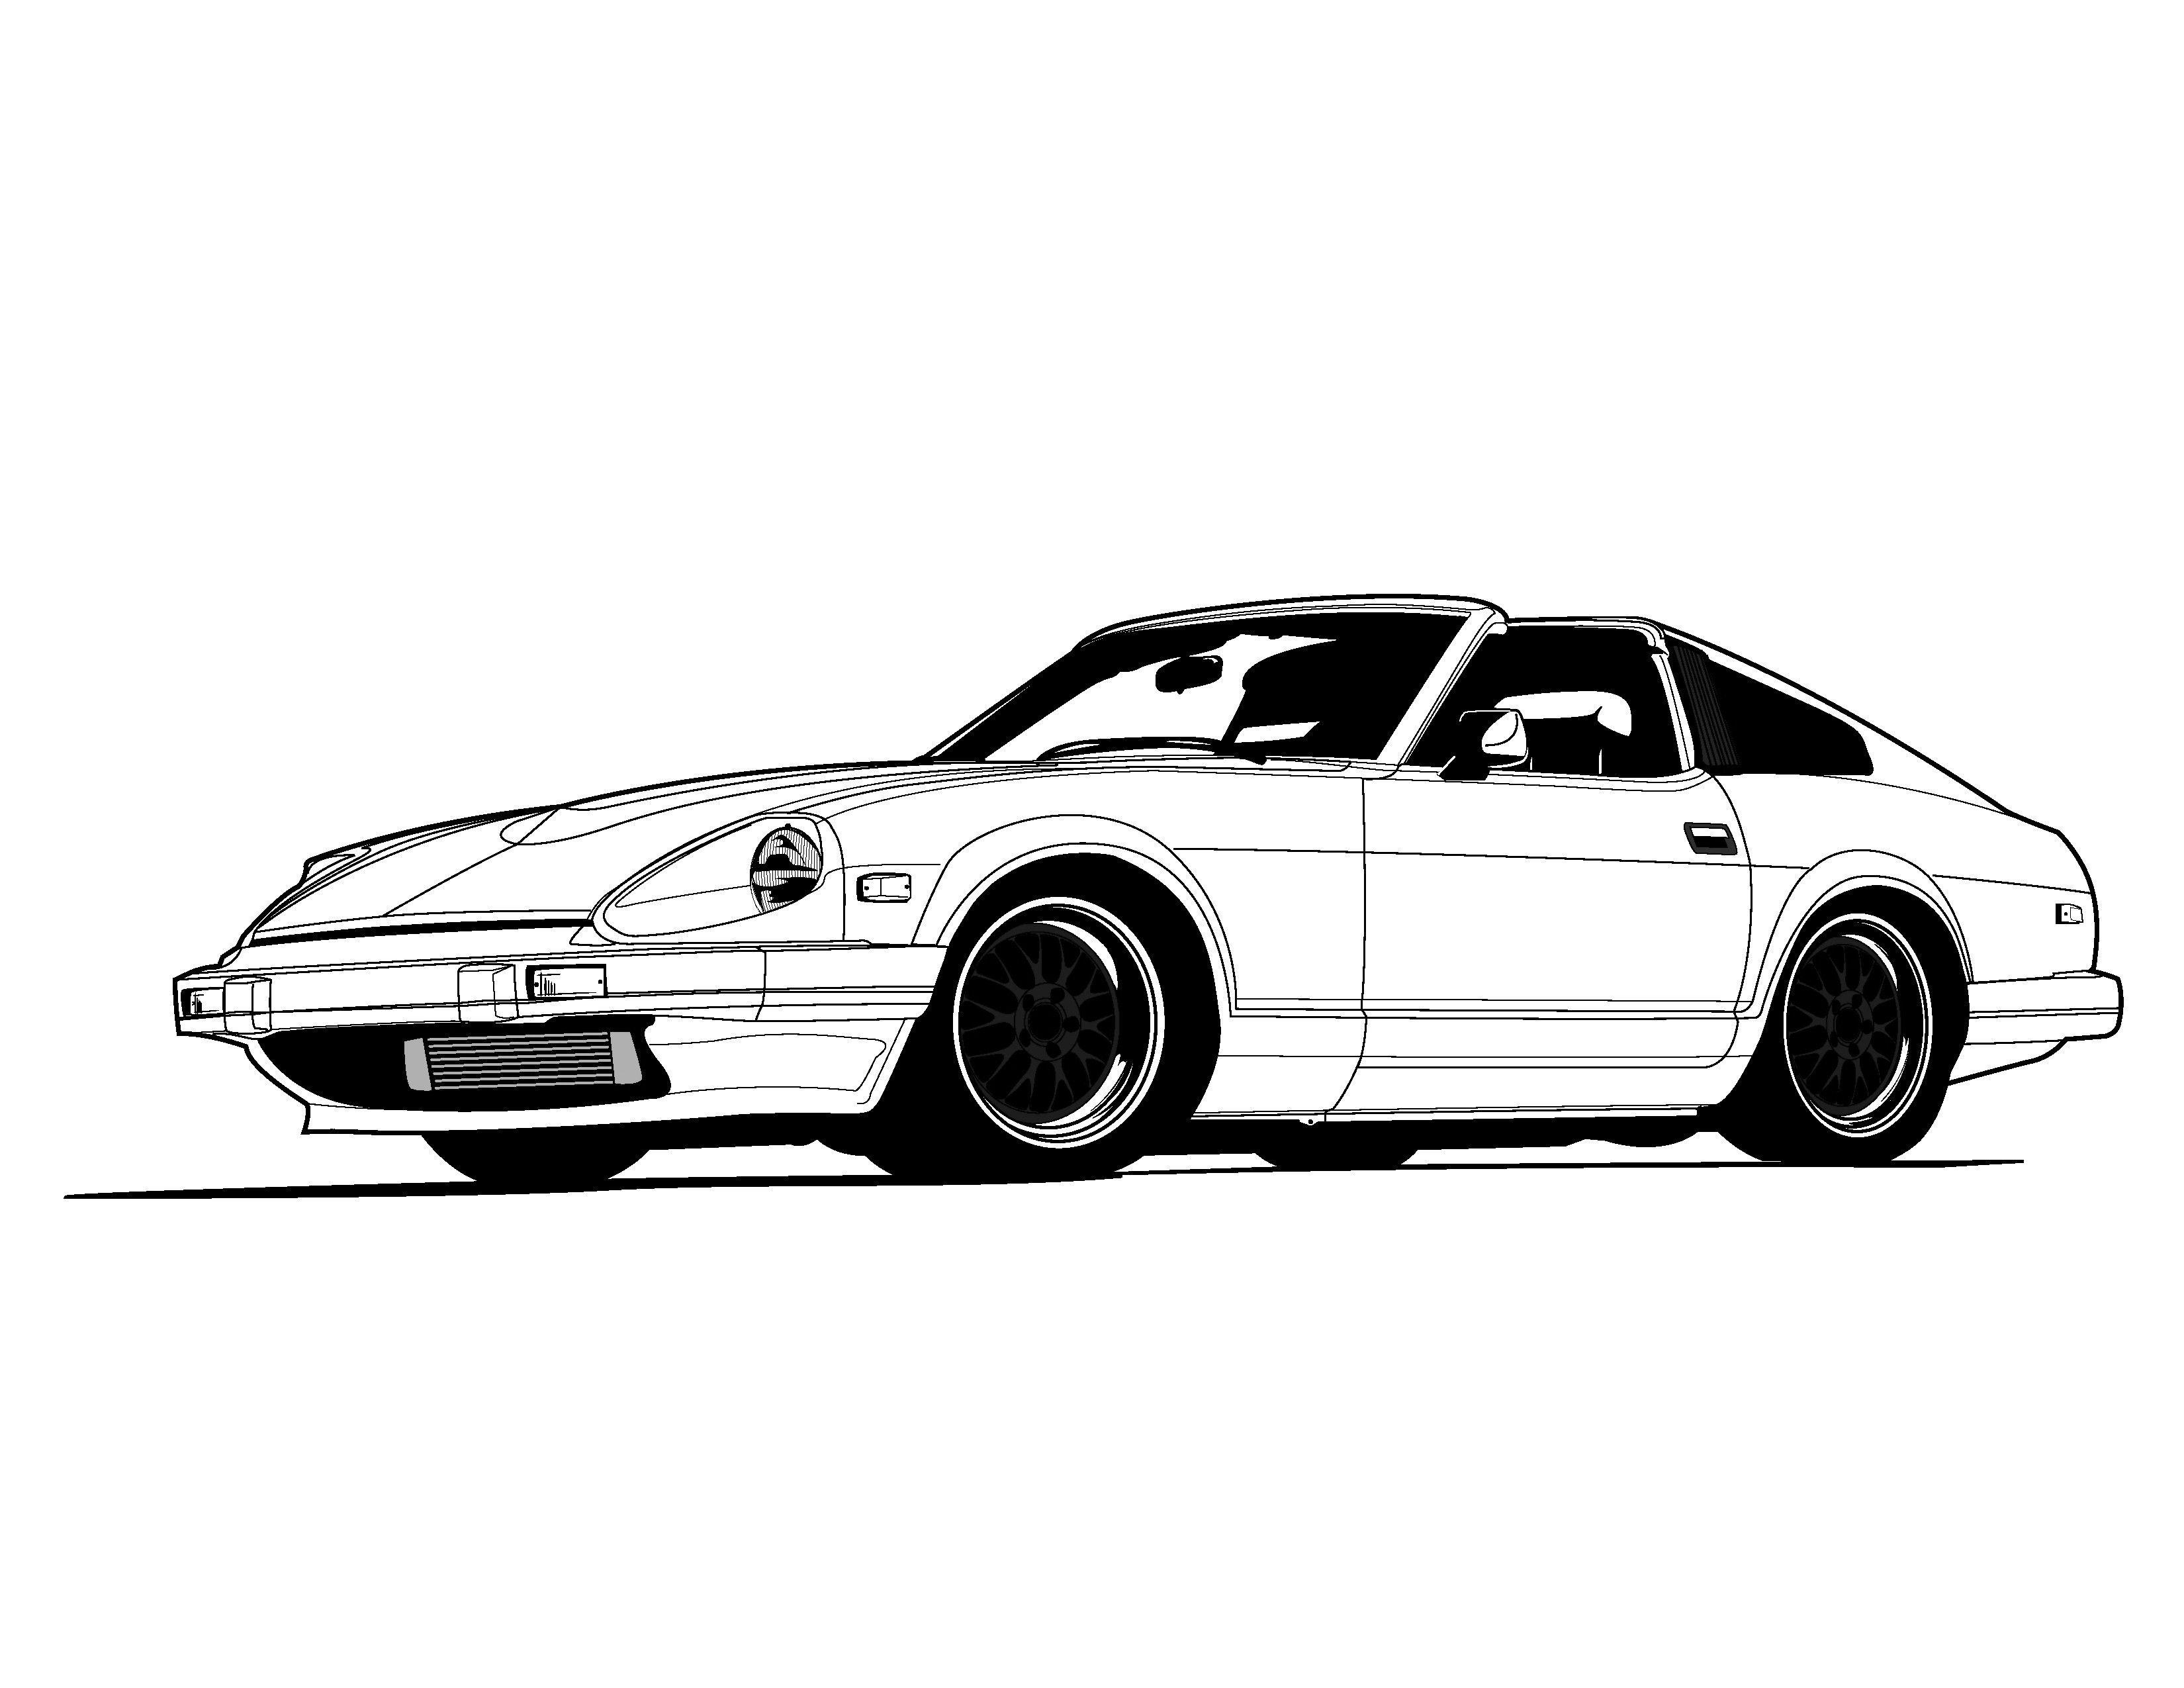 Car vector hd wallpaper android nissan z datsun 240z japan cars